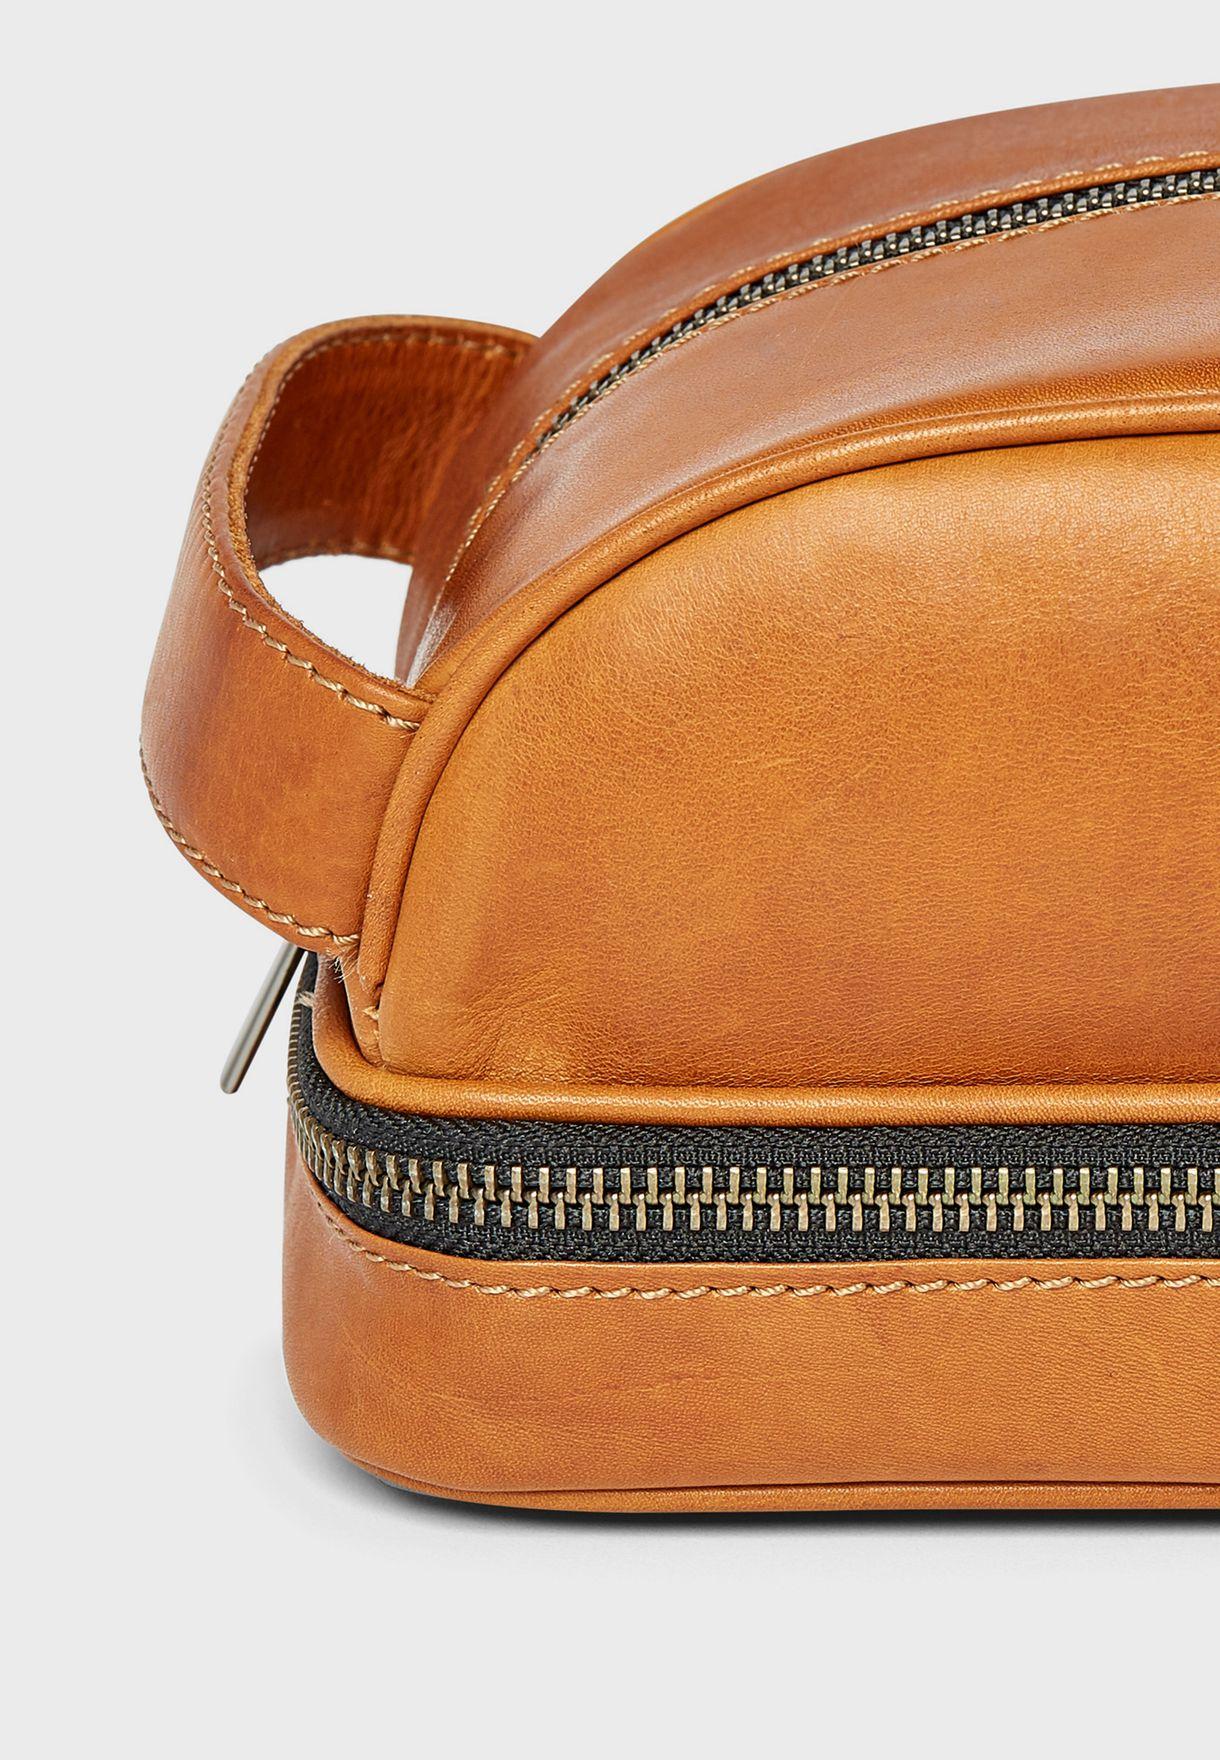 Liva Dopp Toiletry Leather Kit